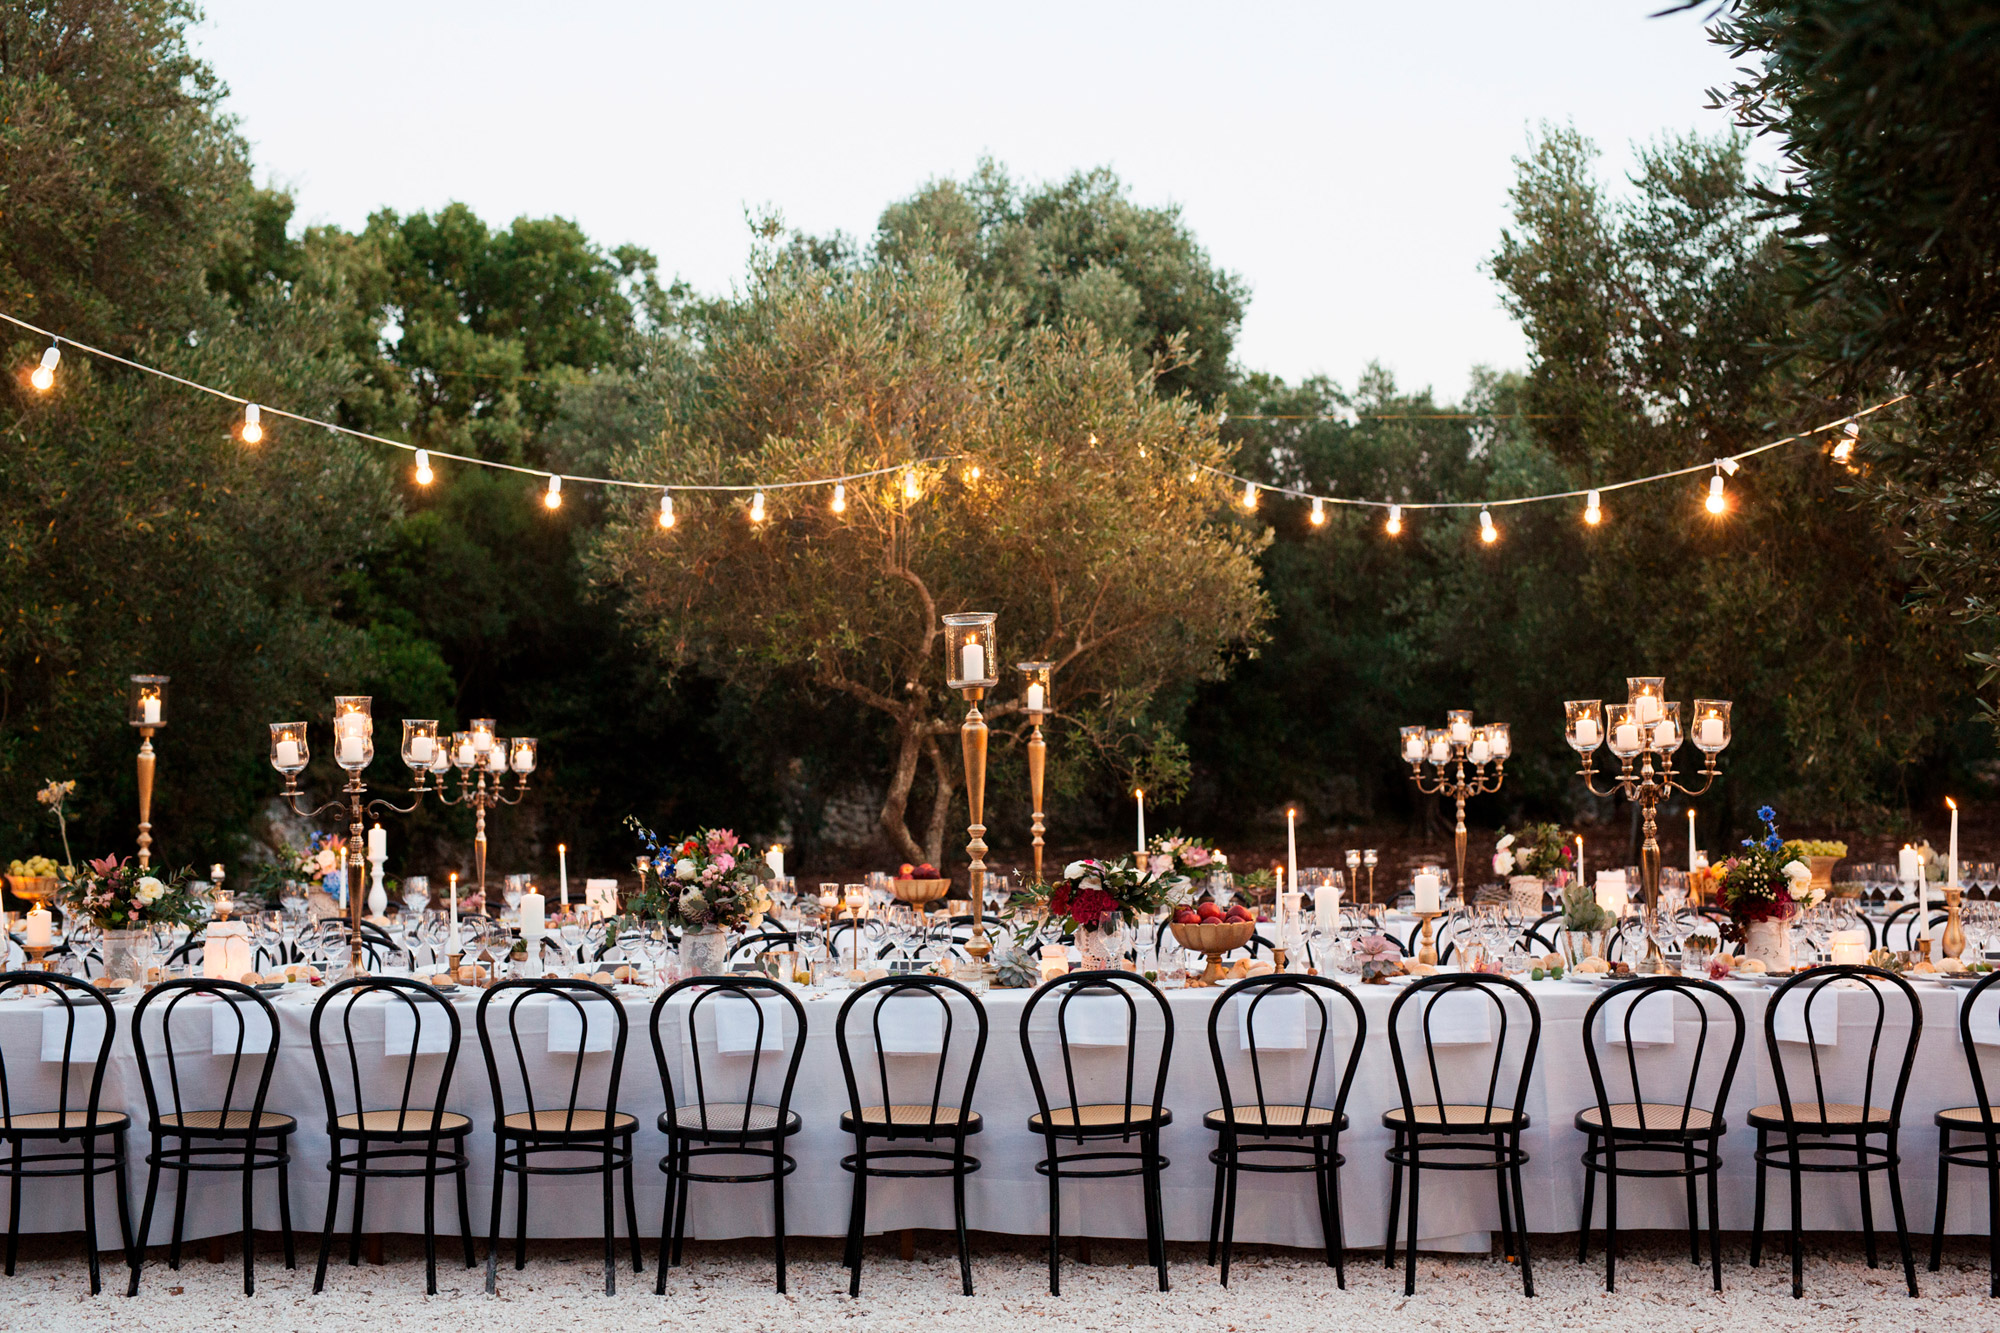 228-FIKUS-PUGLIA-wedding-ostuni-masseria.jpg